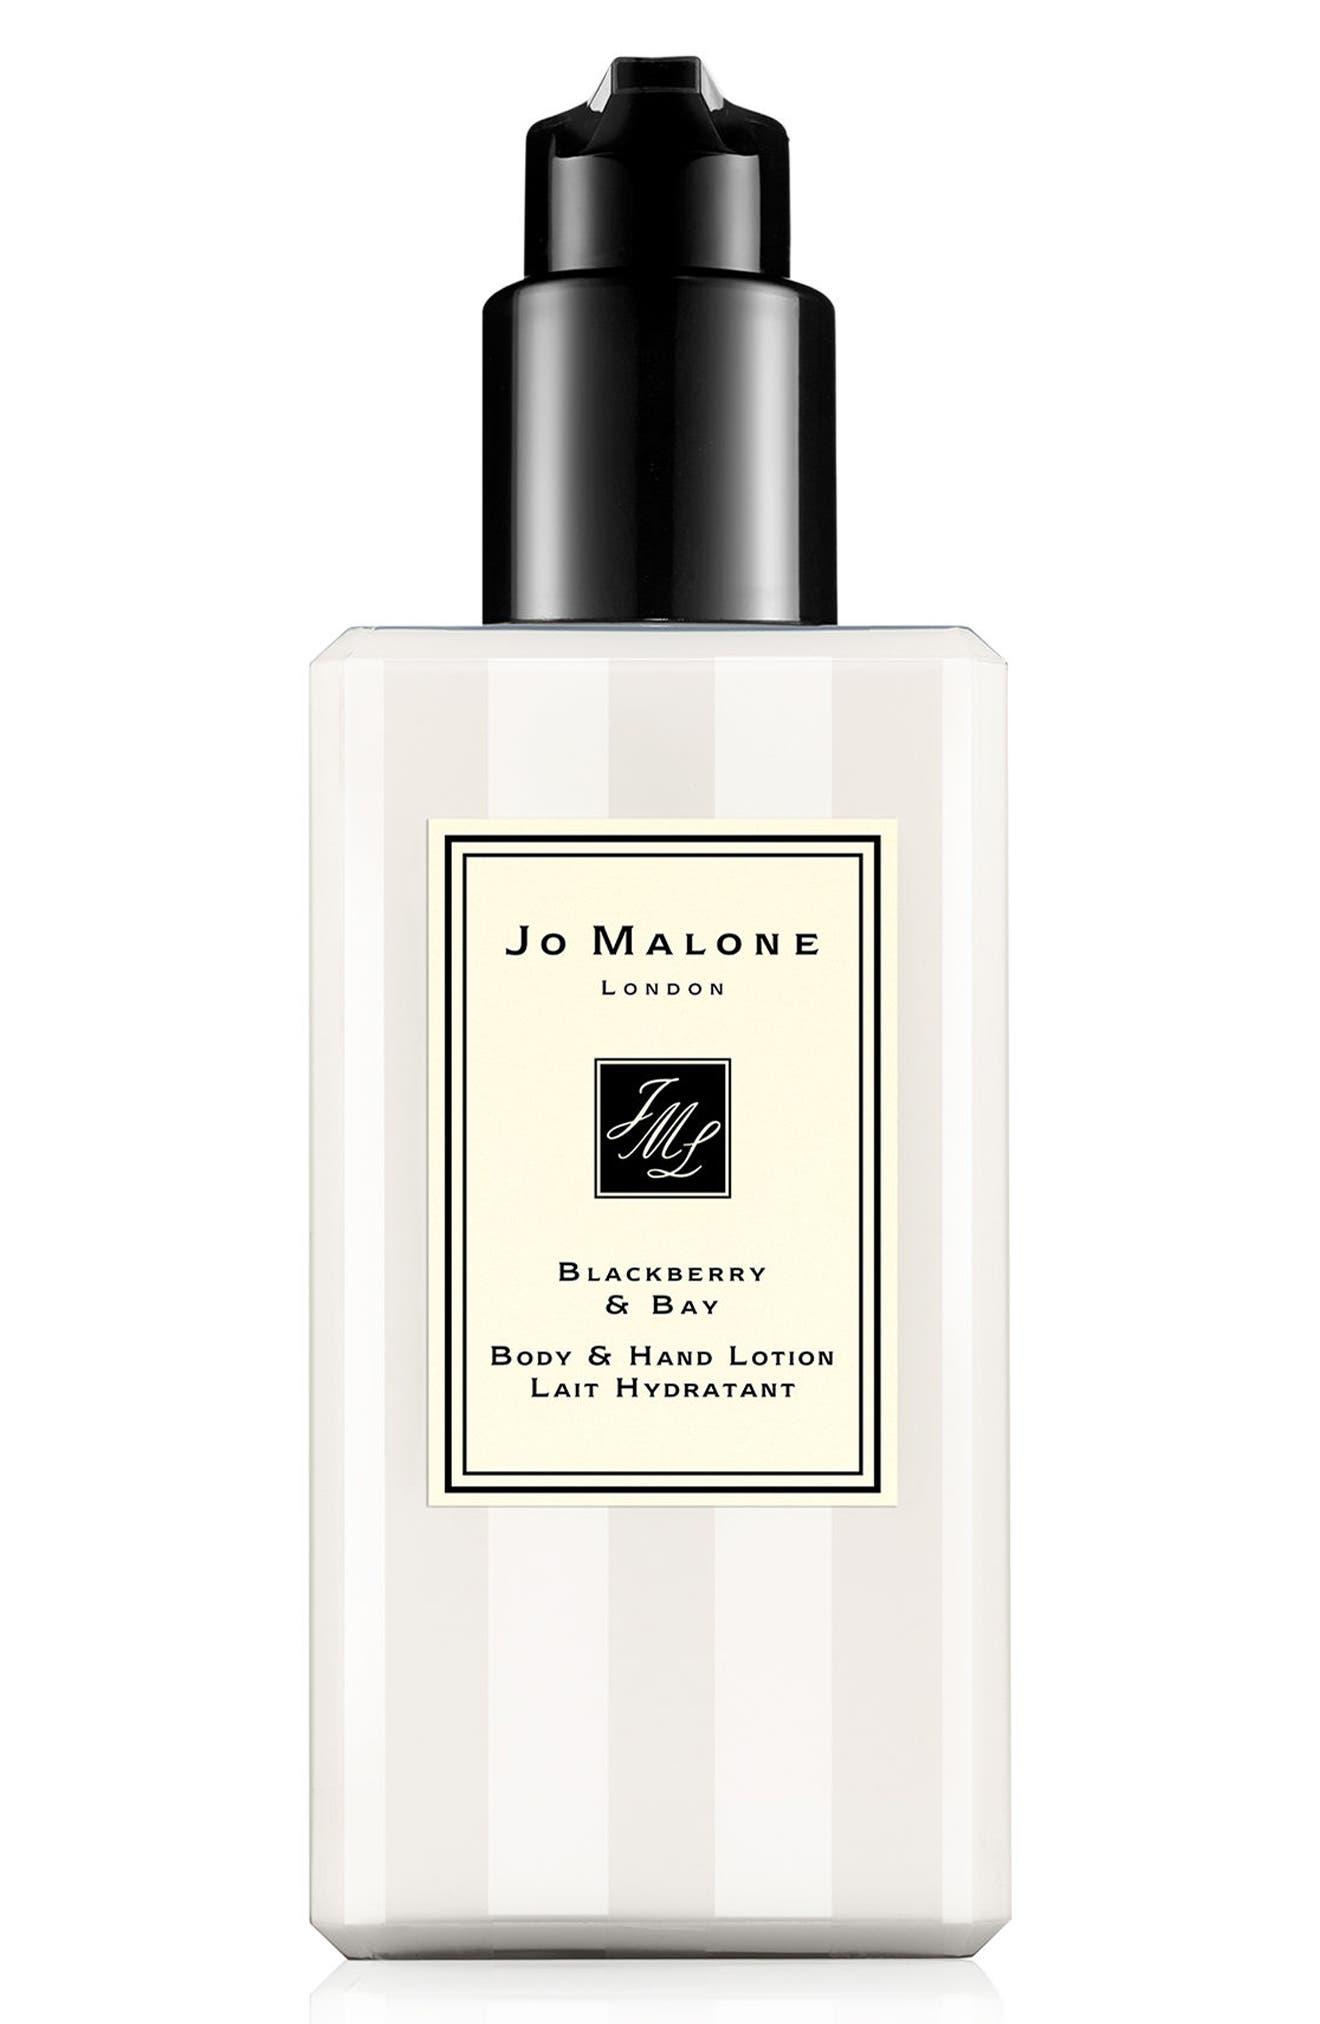 Jo Malone London(TM) Blackberry & Bay Body & Hand Lotion